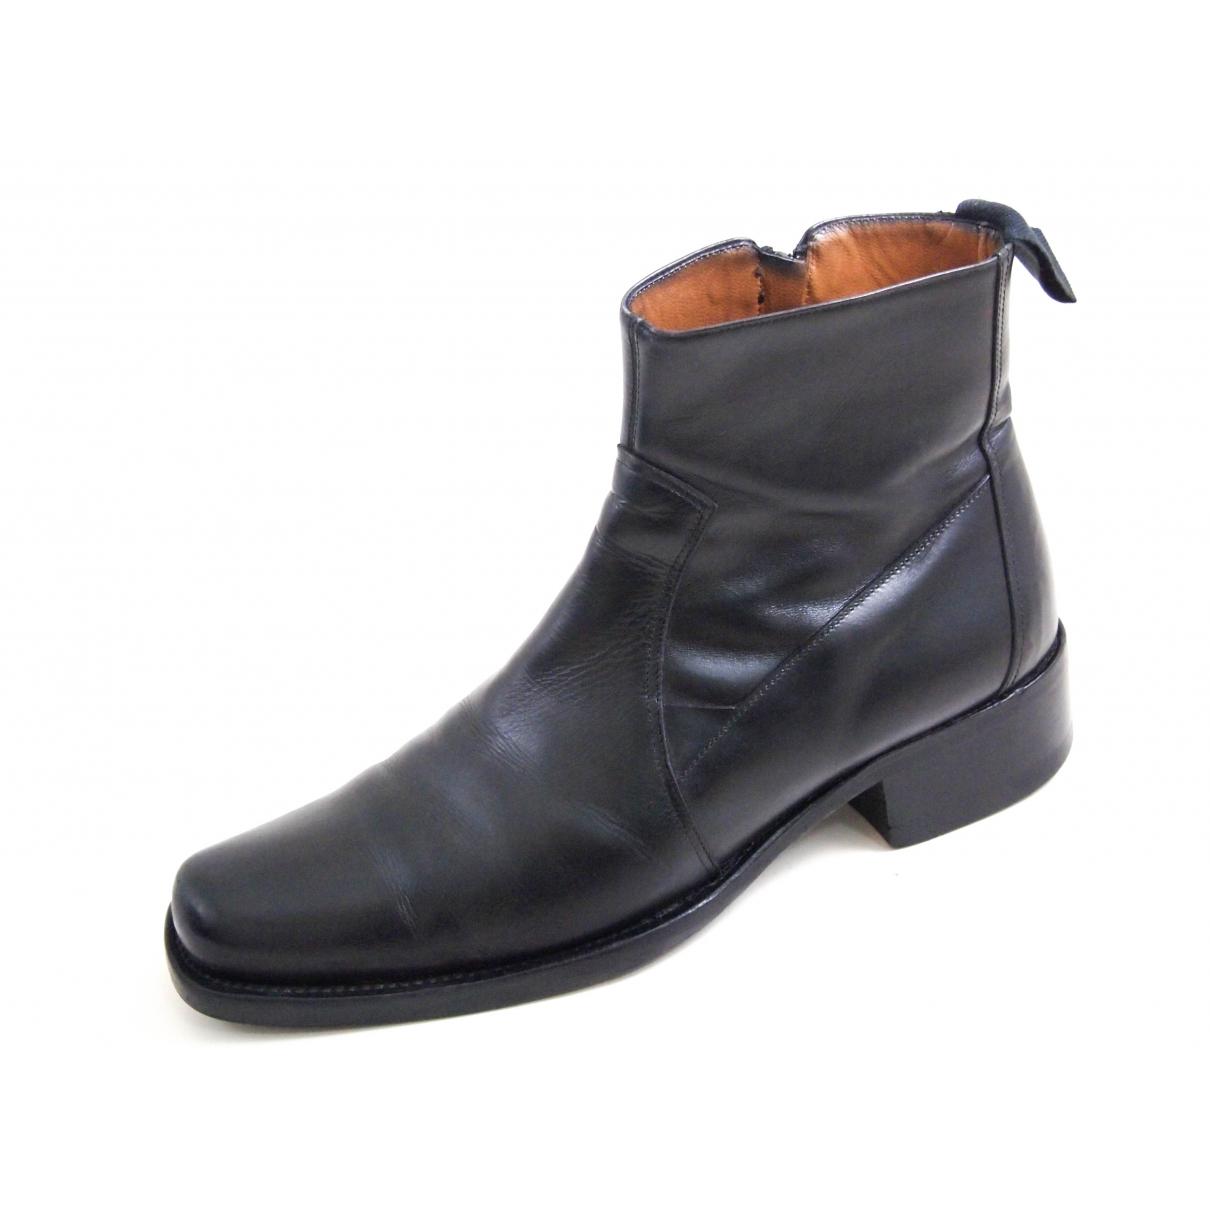 Cesare Paciotti N Black Leather Boots for Men 41 EU